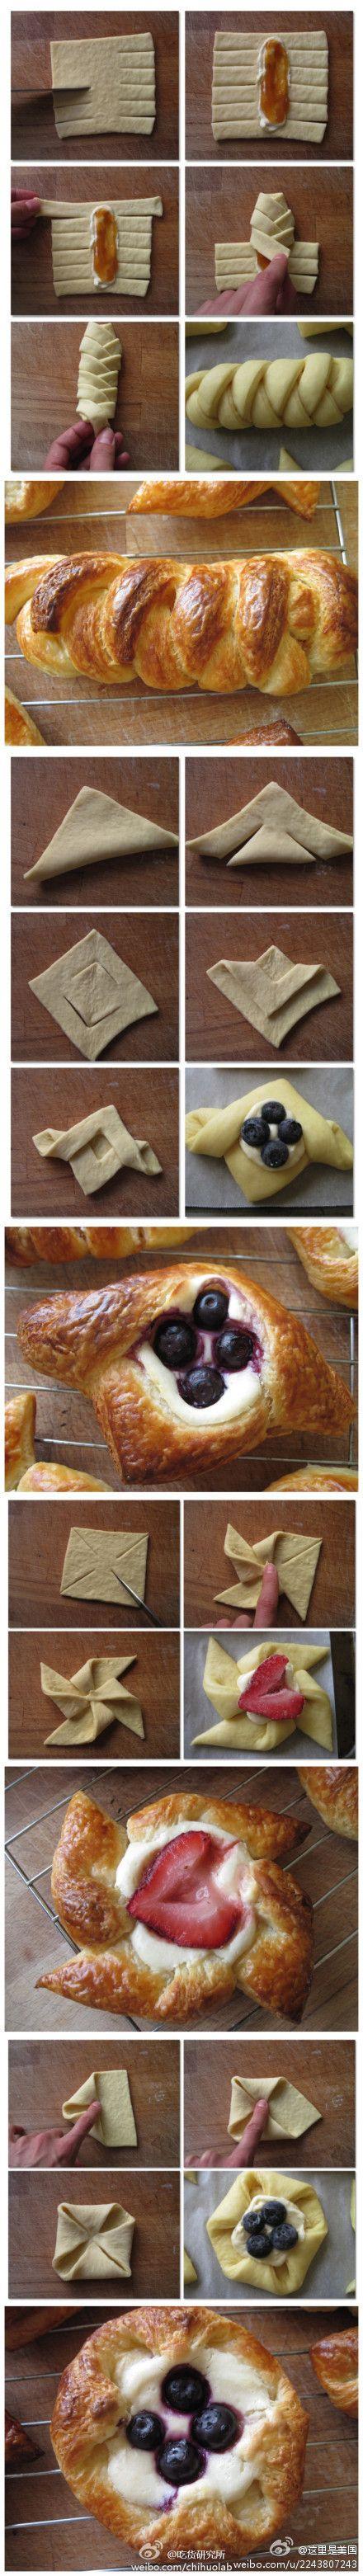 Pastry Folding